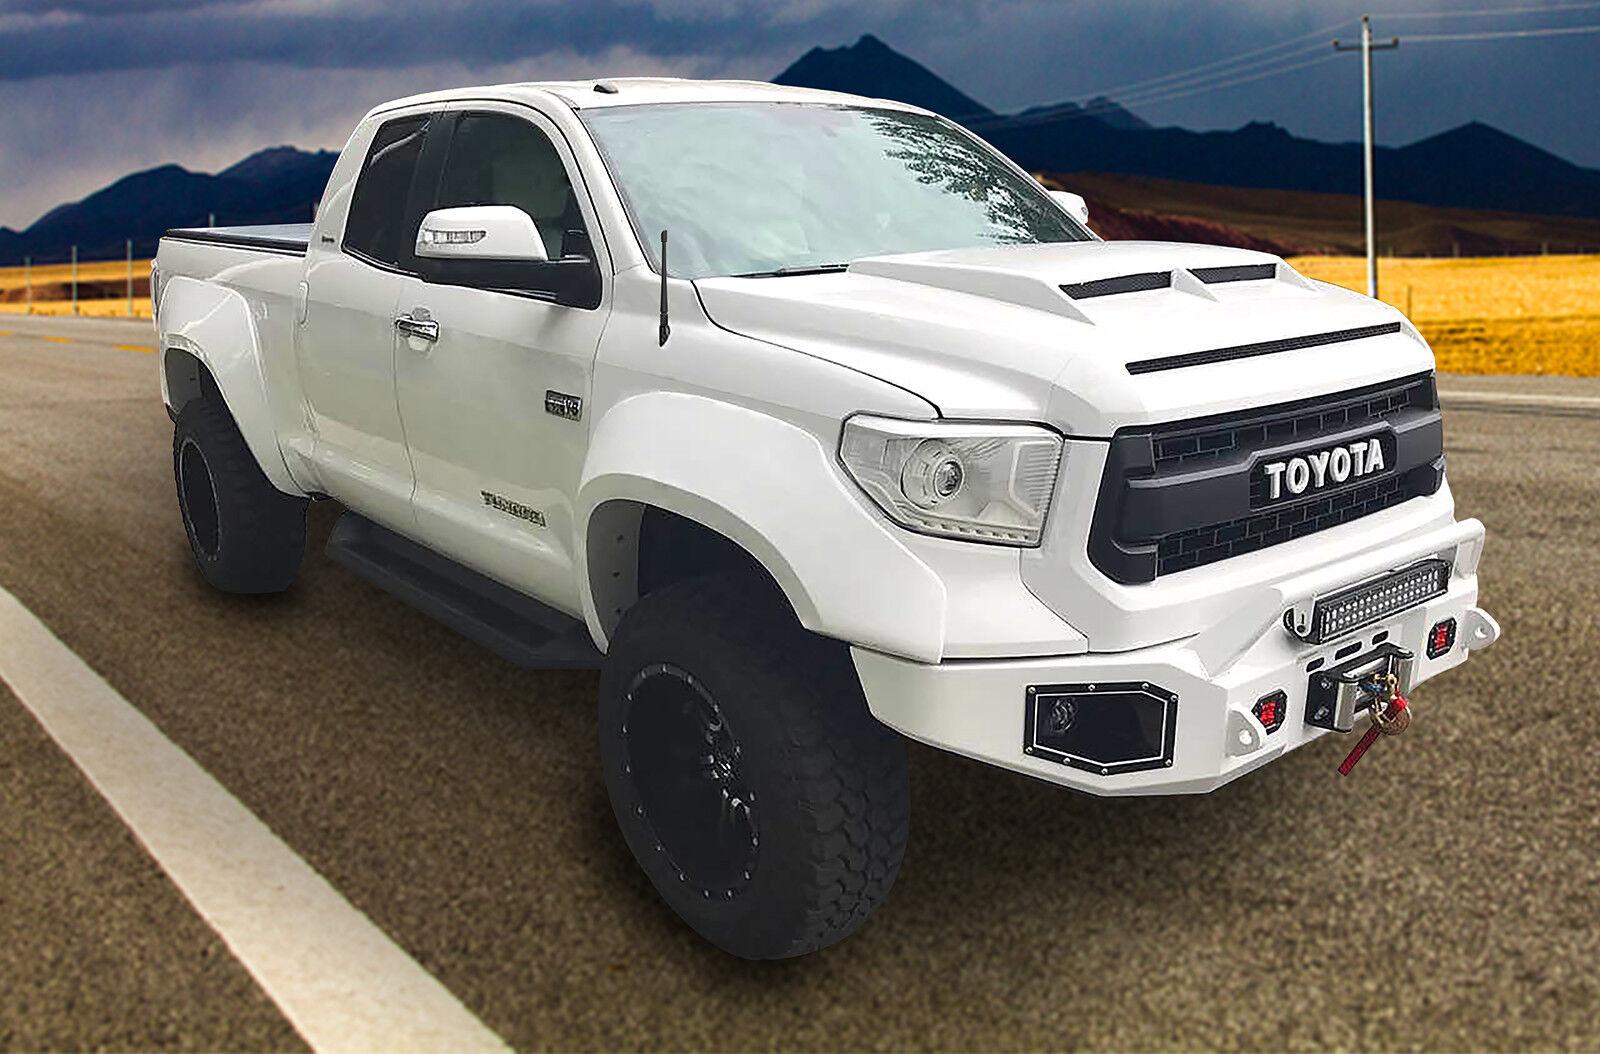 "как выглядит Rydonair 7"" Antenna Replacement for 2000-2021 Toyota Tundra Tacoma FJ Cruiser фото"